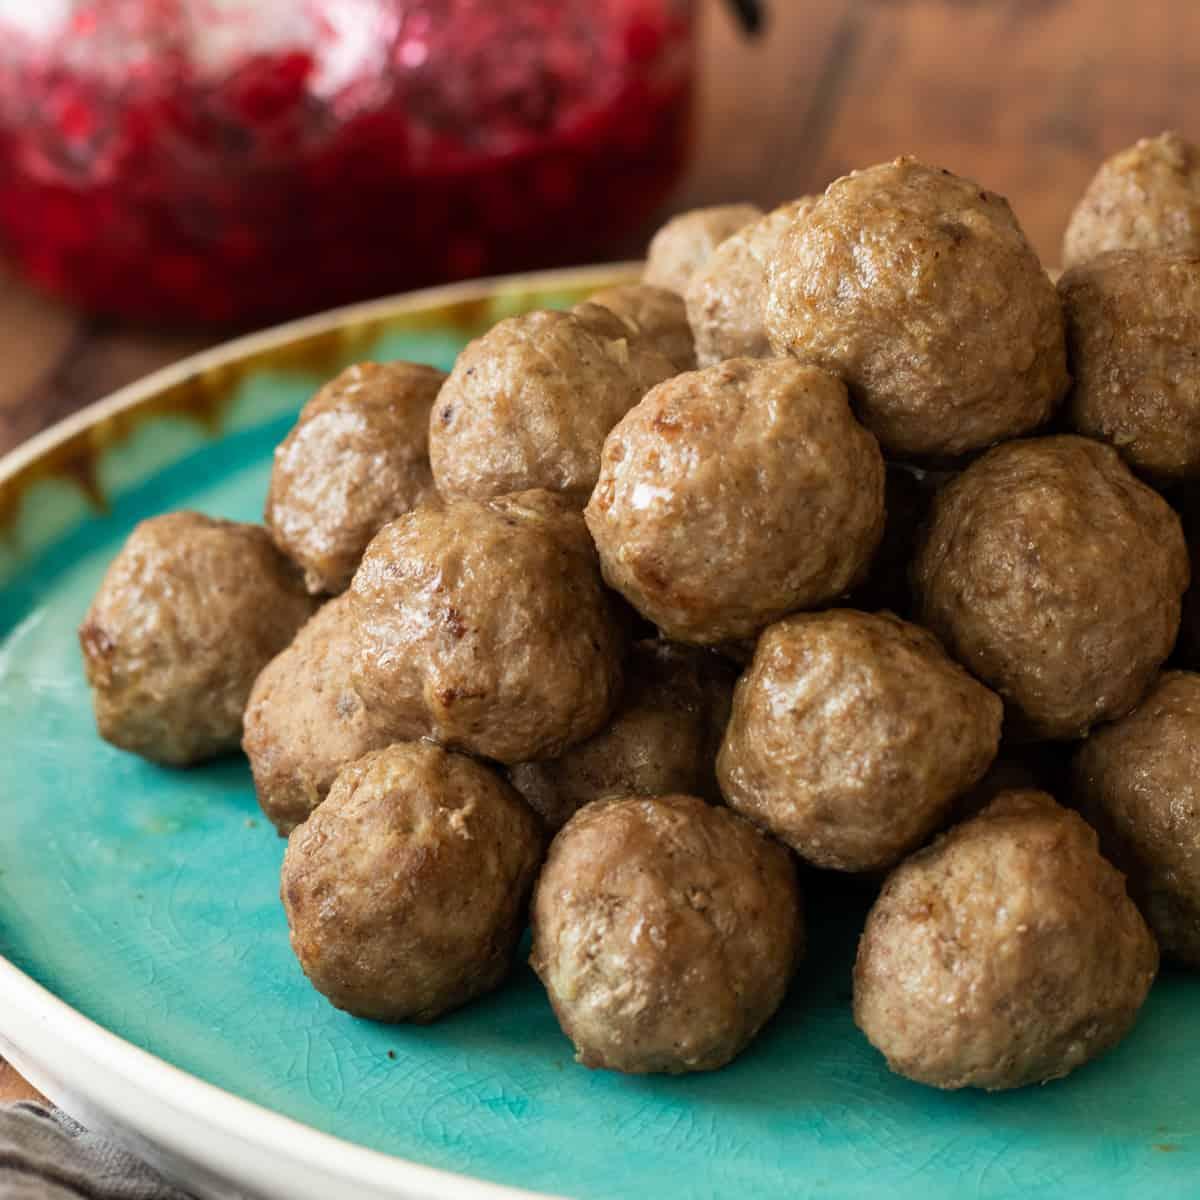 air fryer meatballs on a blue plate